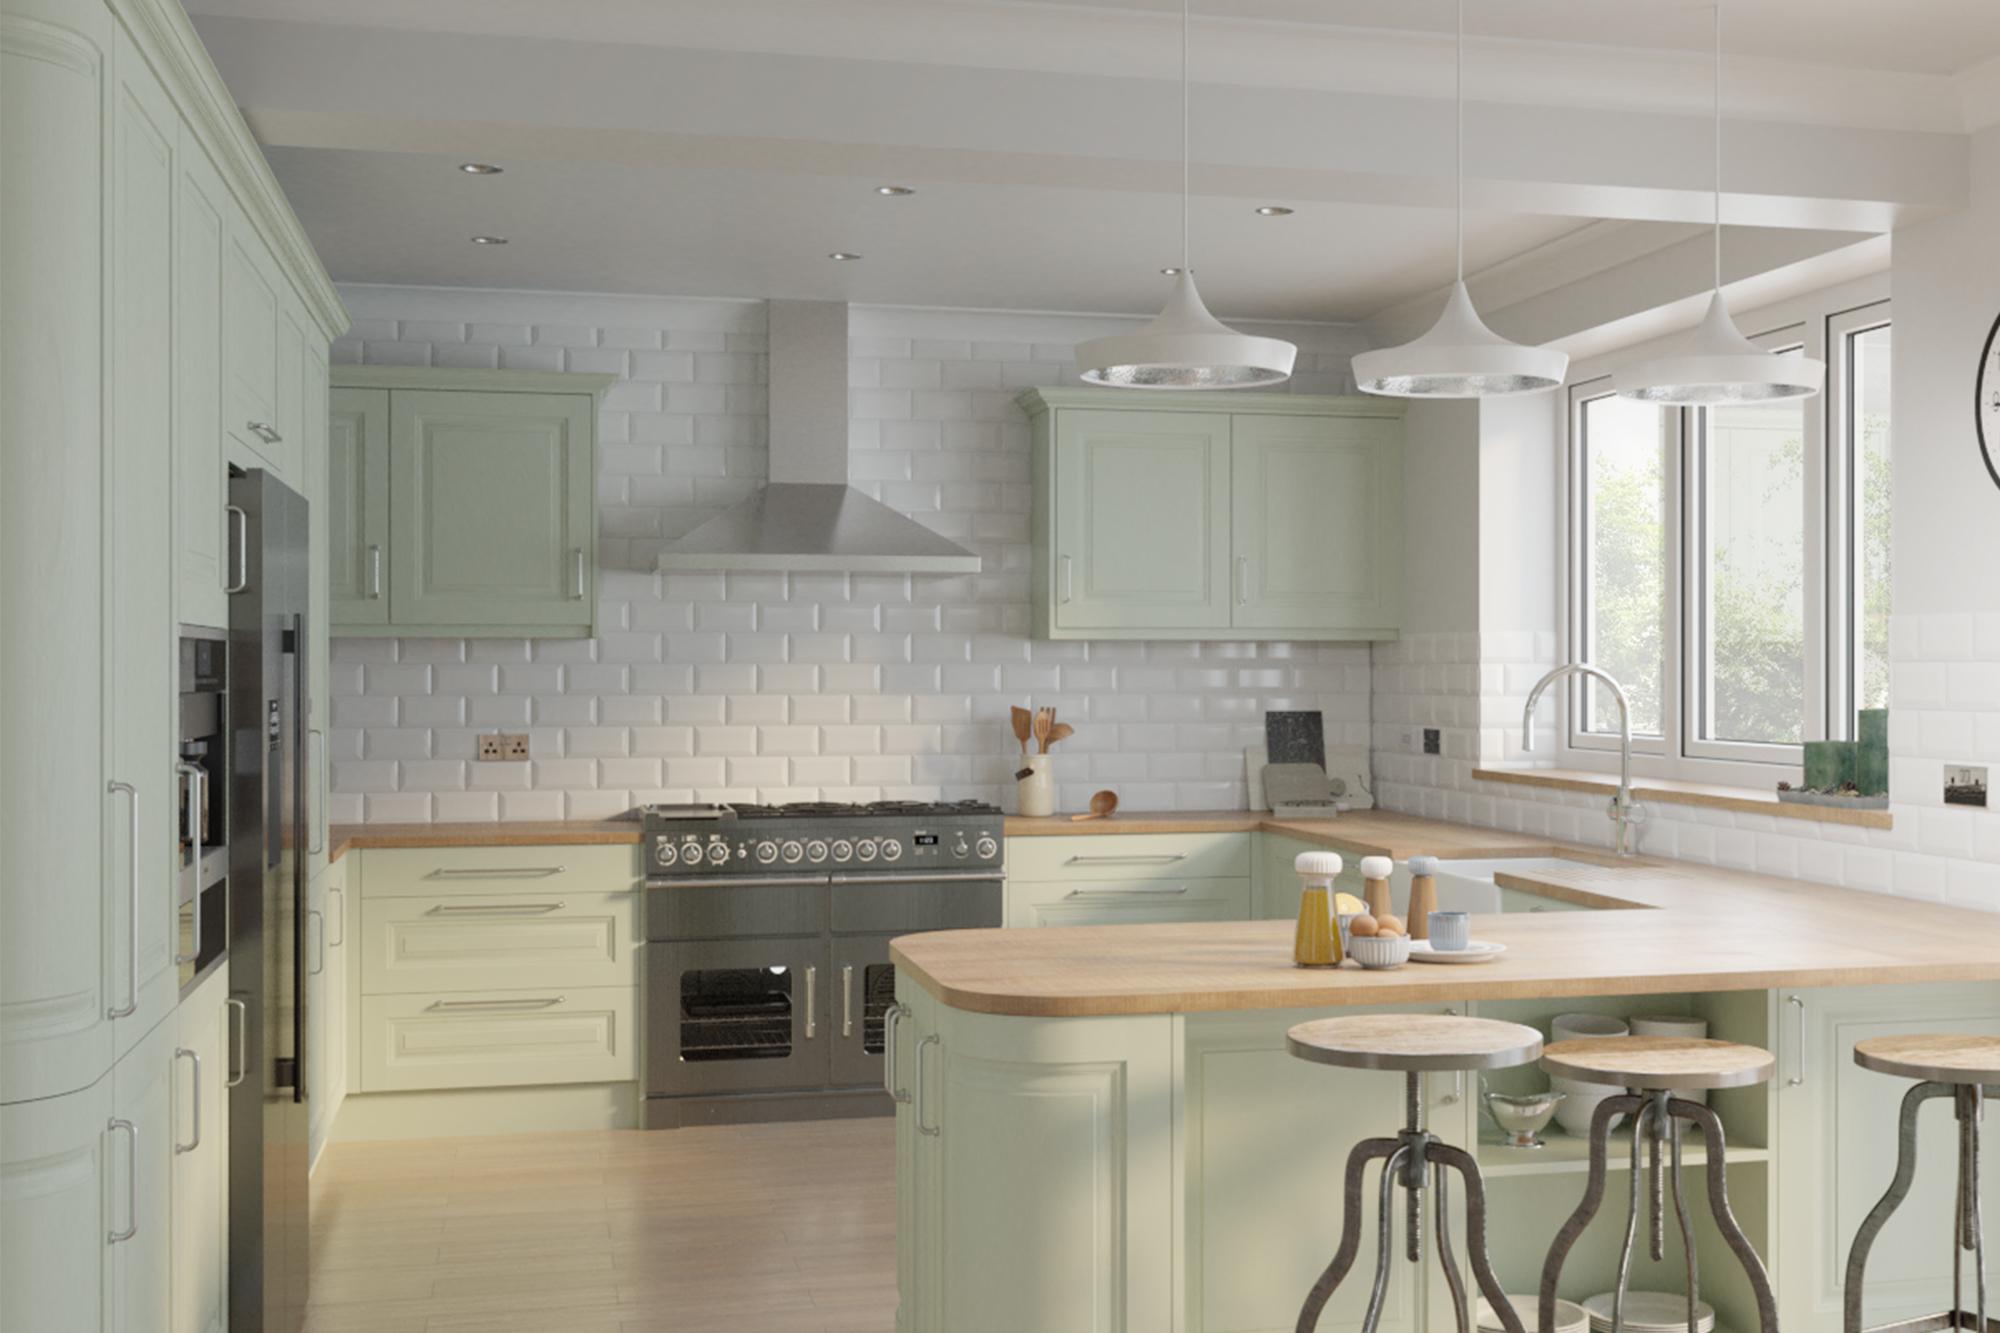 Jefferson Sage Green Cheap Kitchen Units And Cabinets